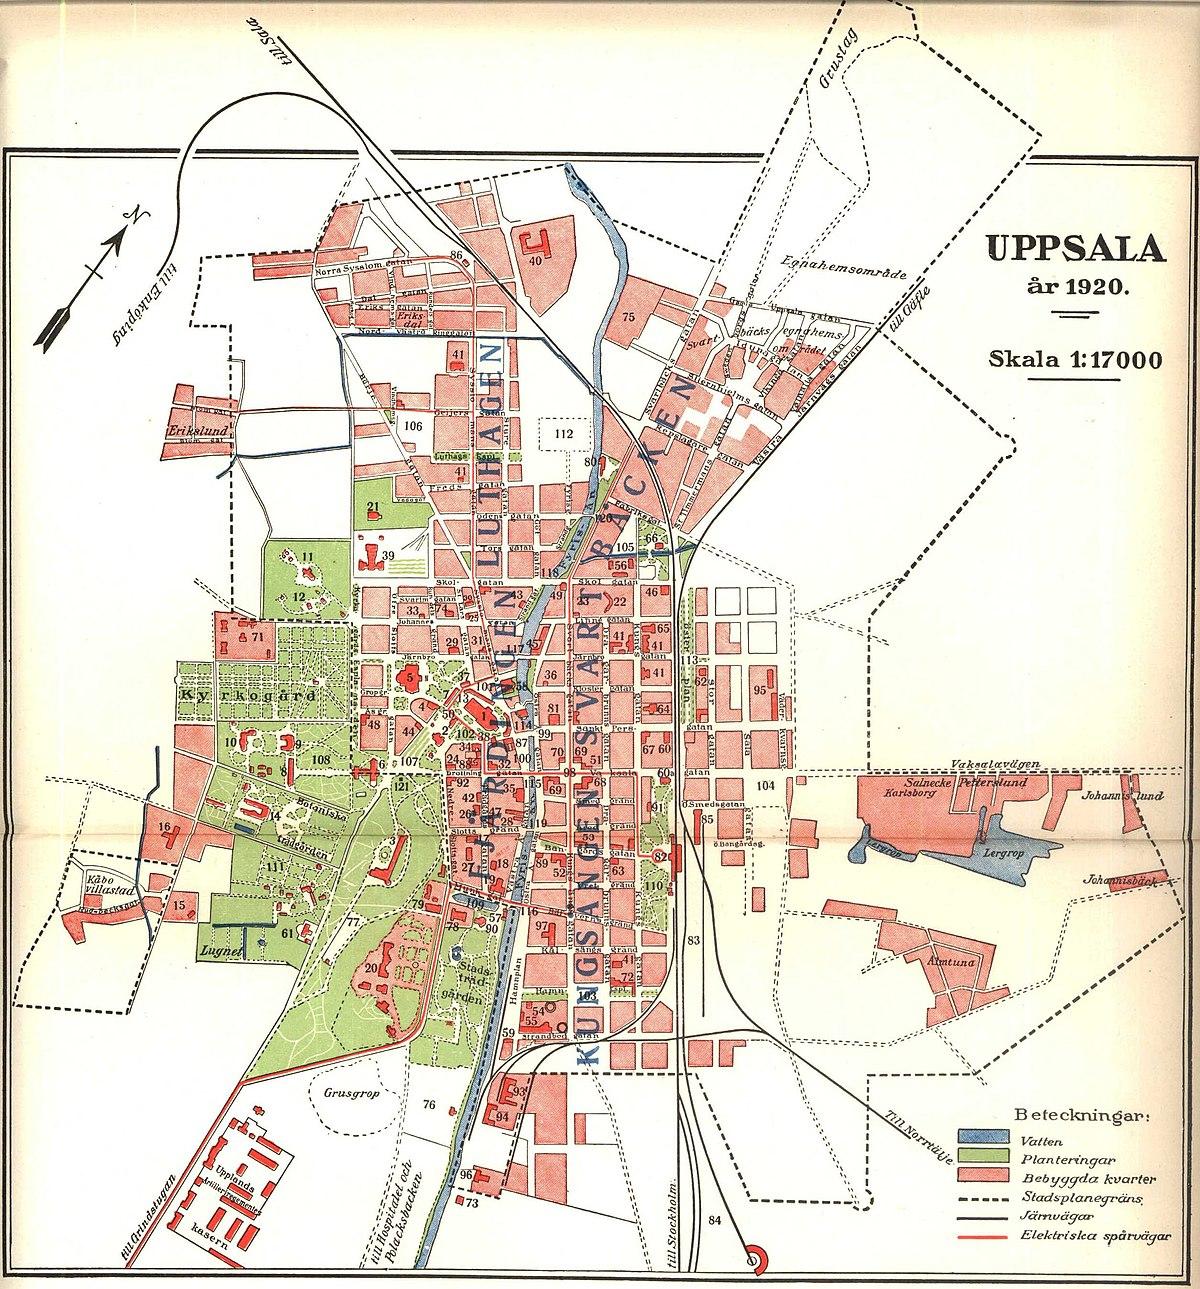 File Karta Over Uppsala 1920 Nordisk Familjebok Jpg Wikimedia